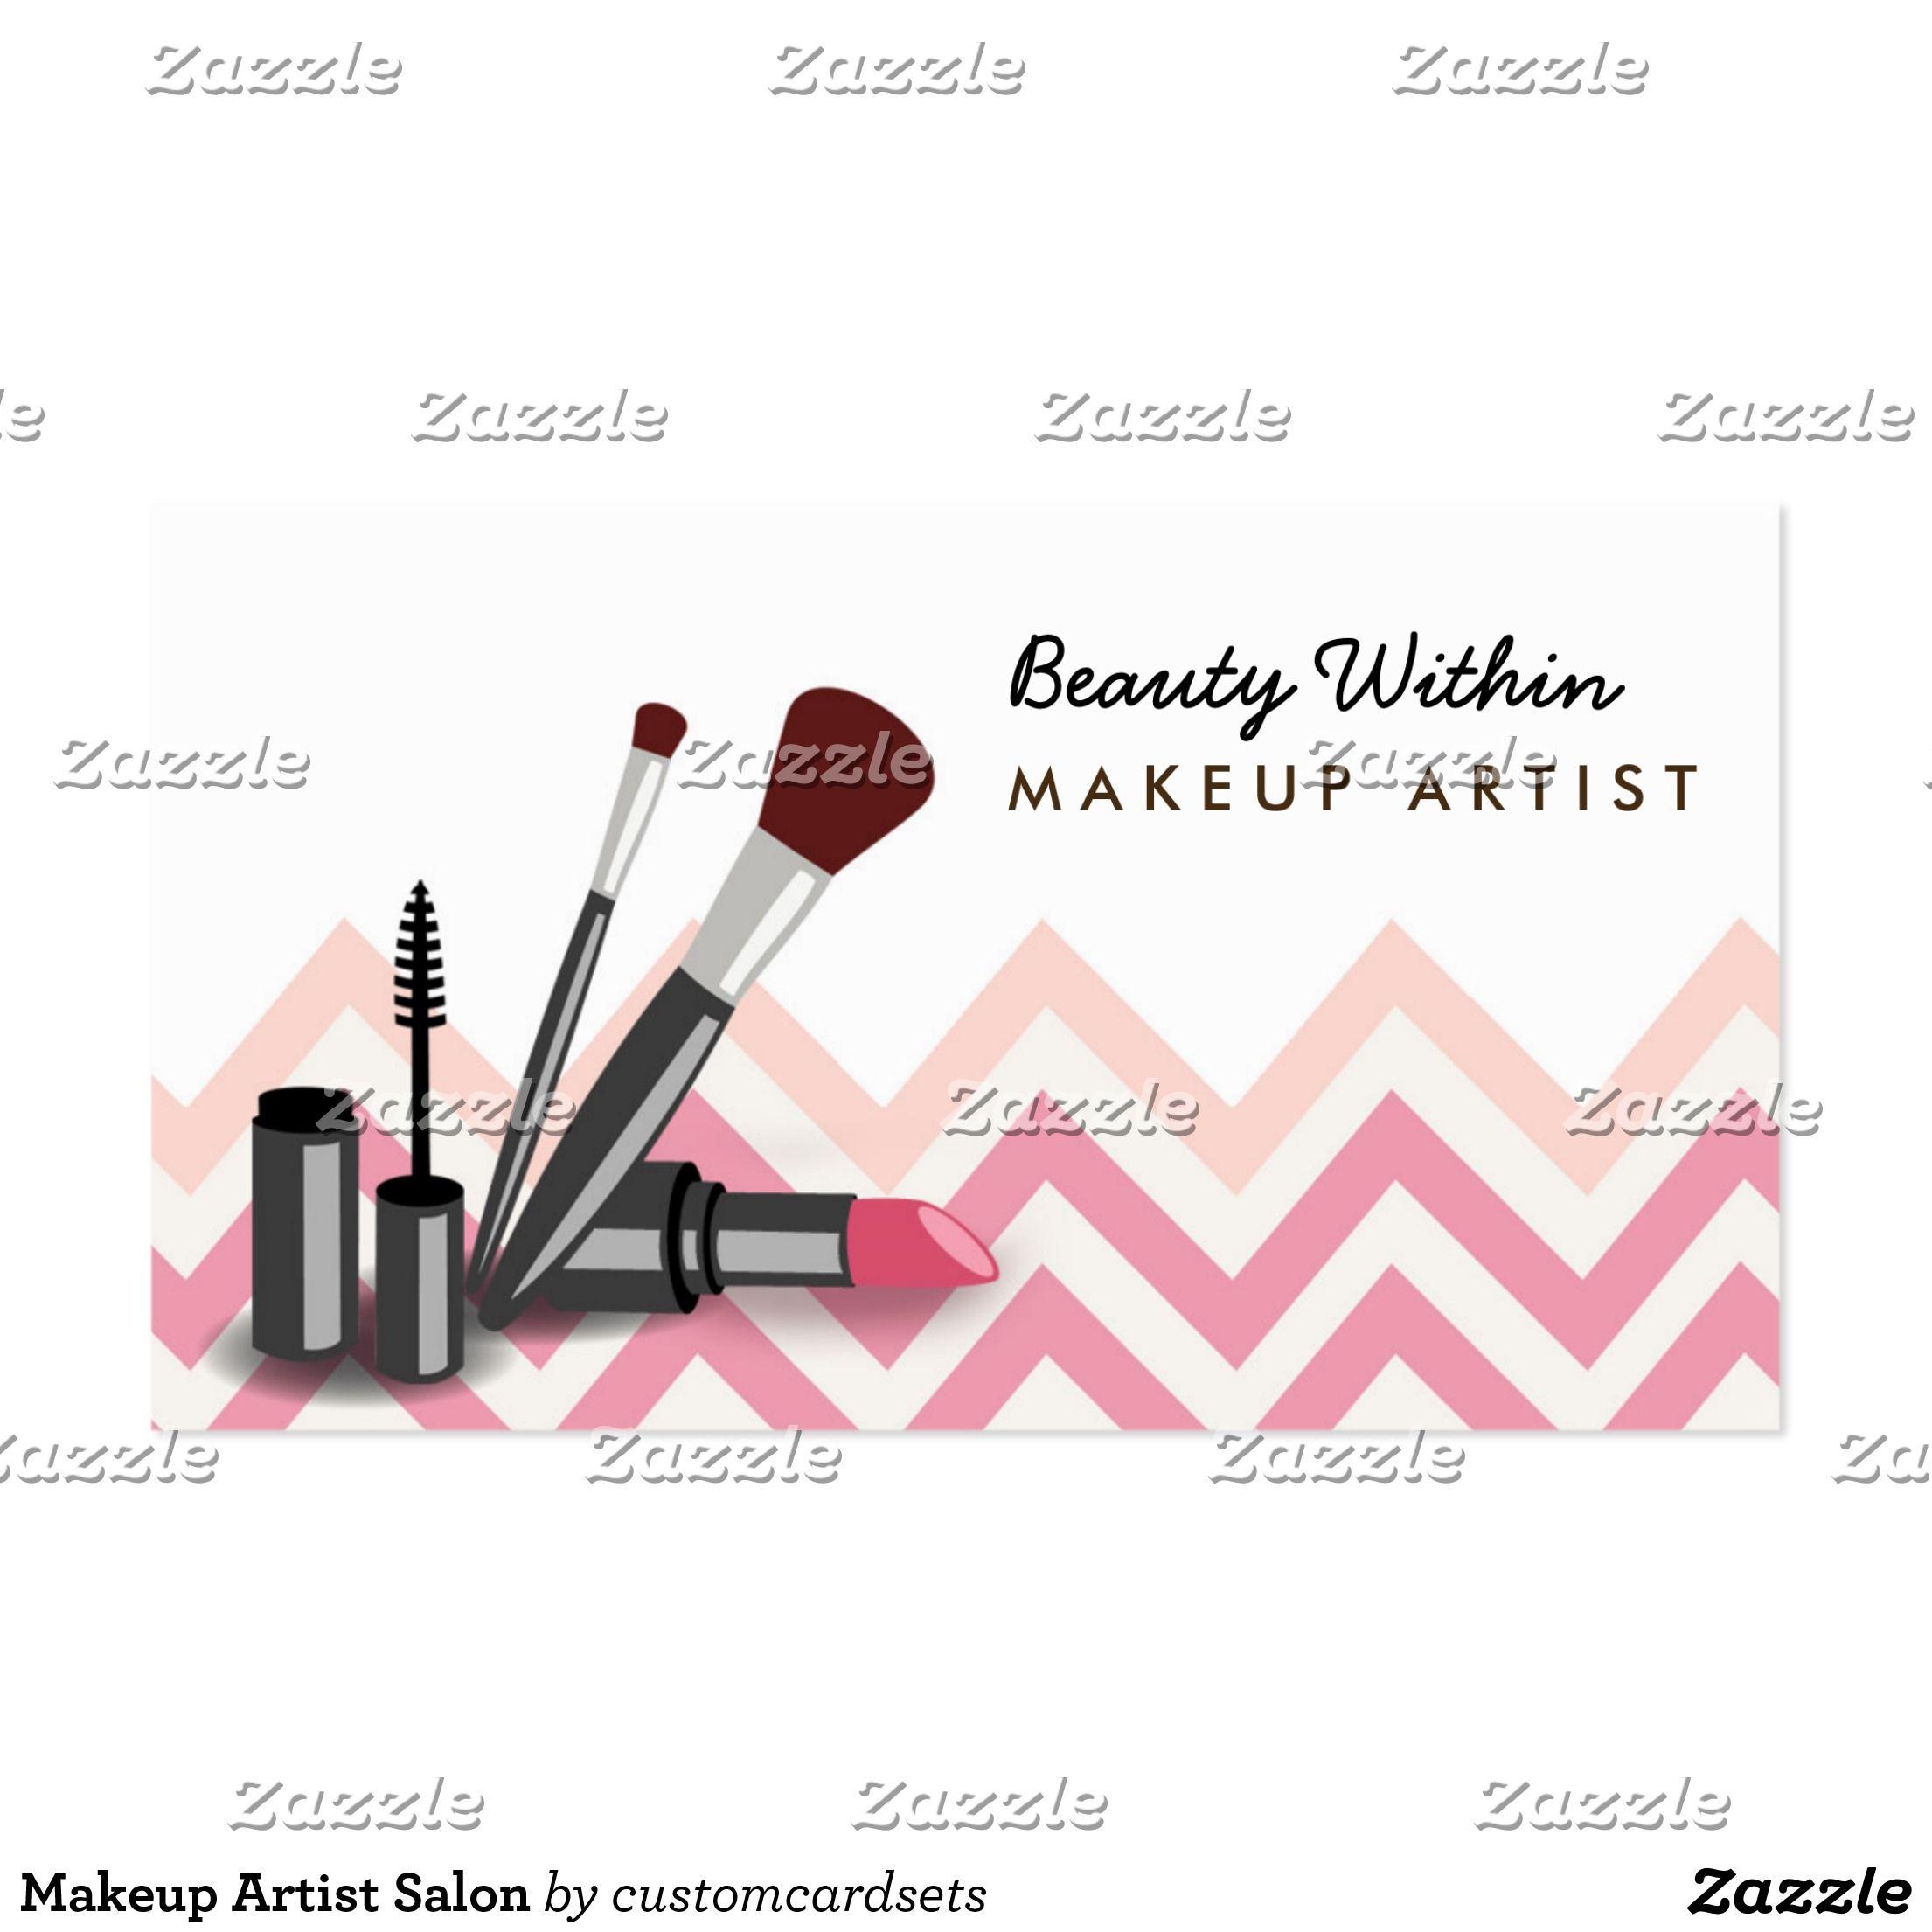 Makeup Artist Salon Business Card Zazzle Com Salon Business Cards Business Cards Printing Double Sided